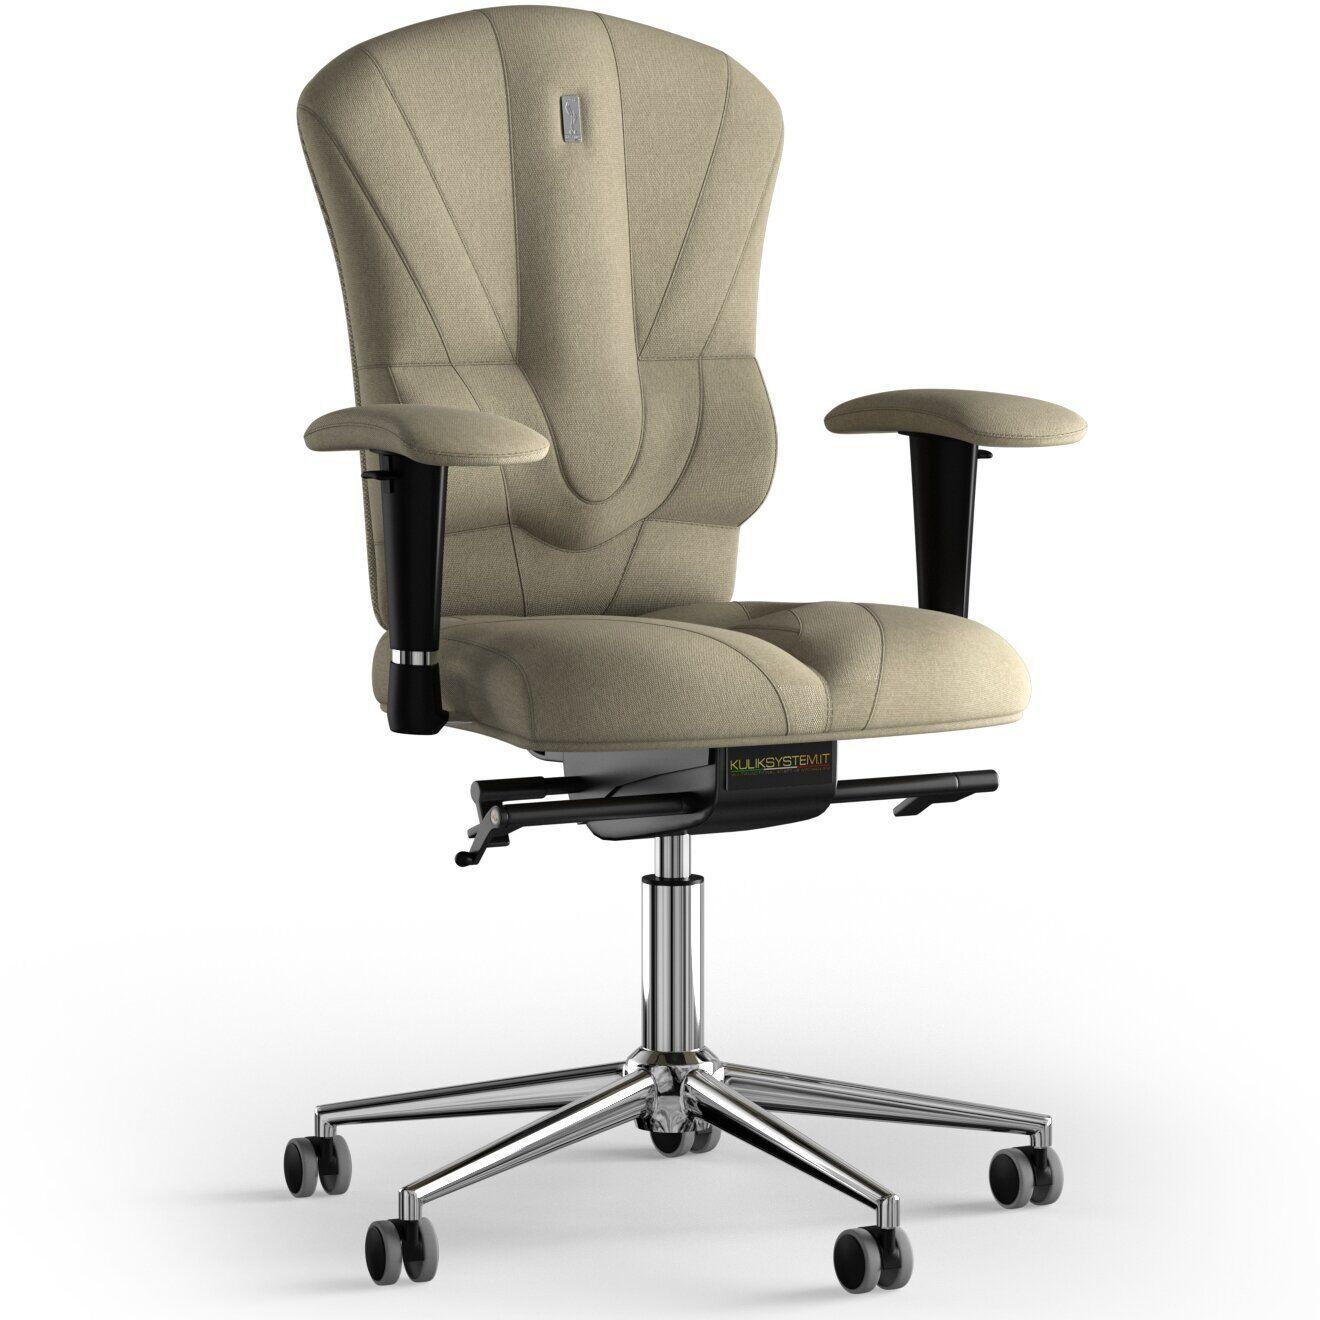 Кресло KULIK SYSTEM VICTORY Ткань без подголовника без строчки